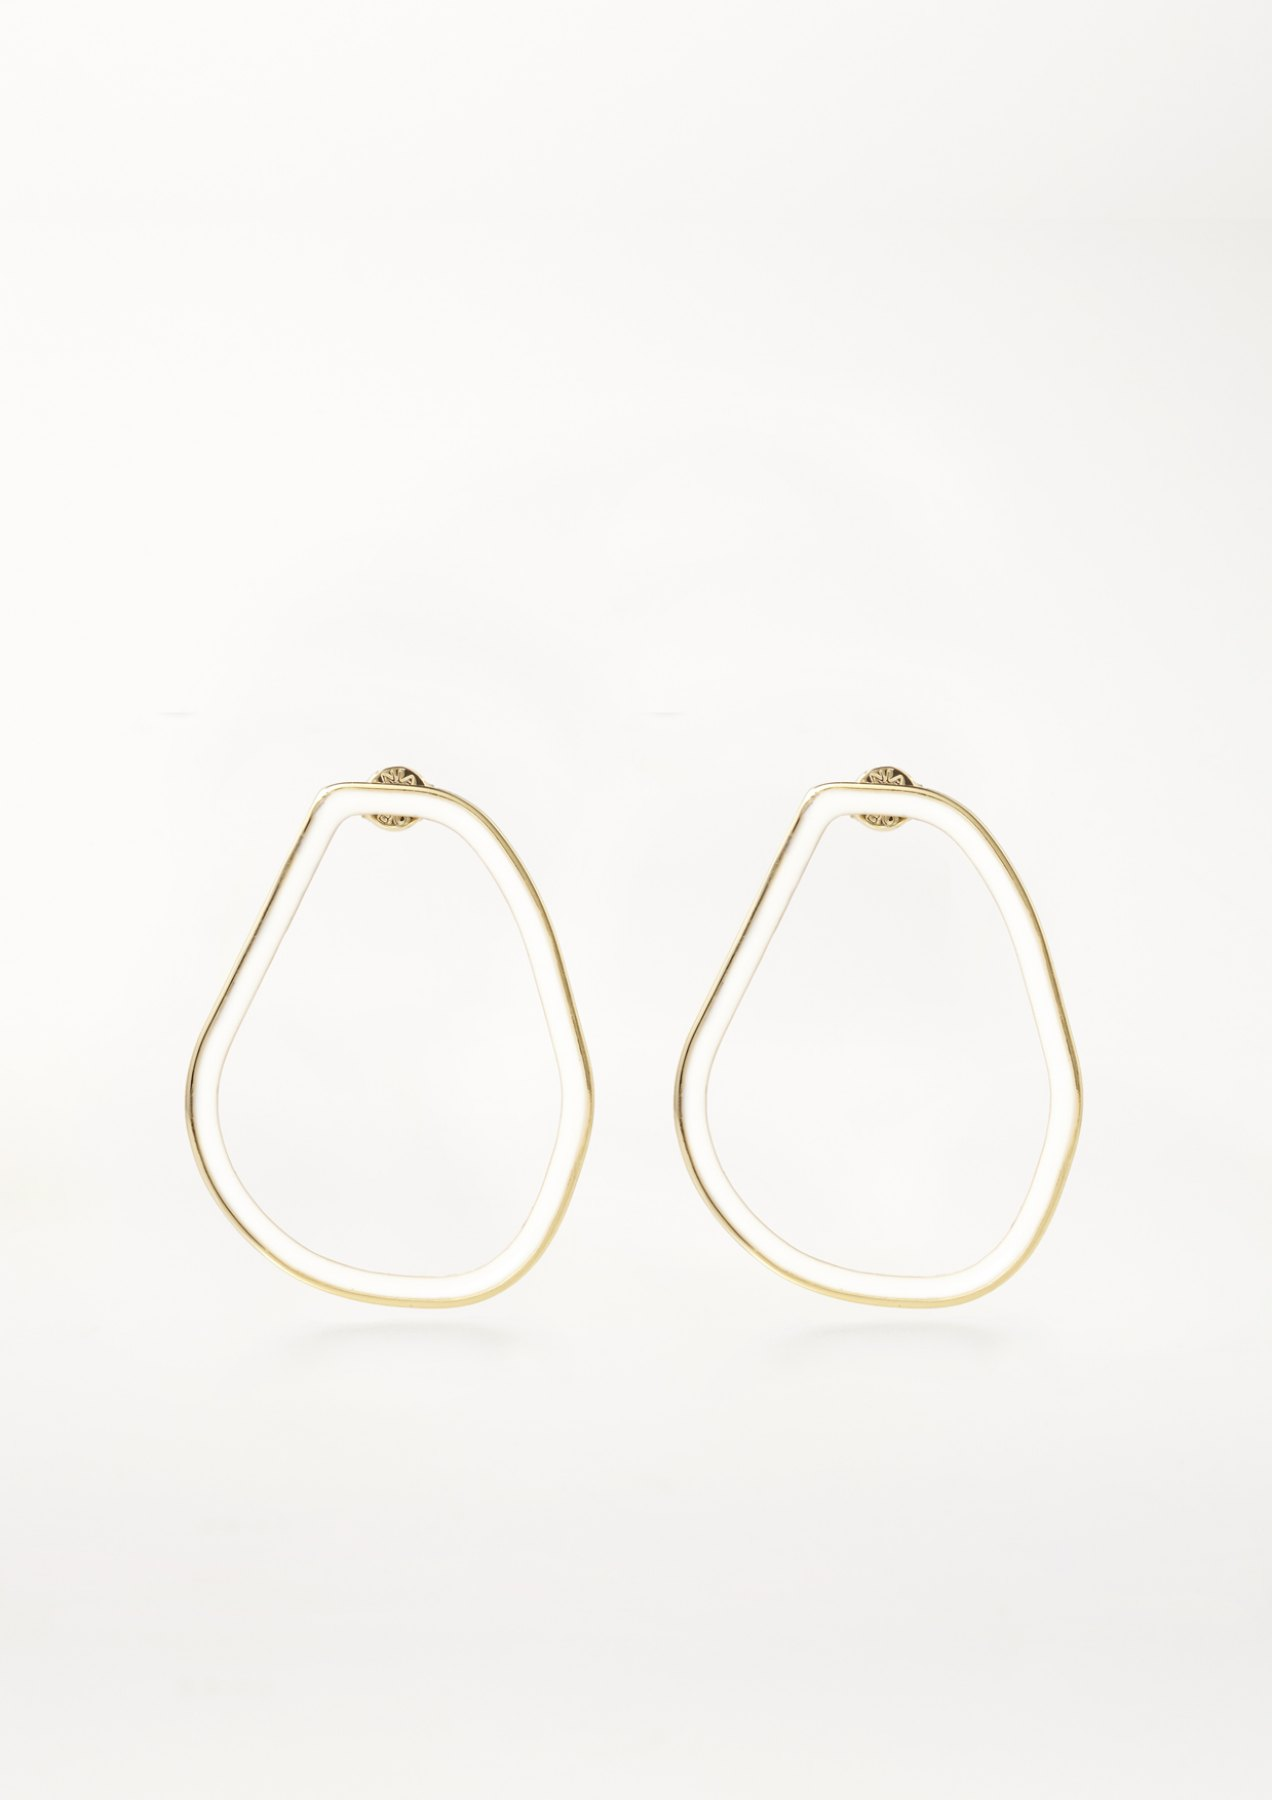 xenia bous jewellery coloured stone 04 earrings weiß white